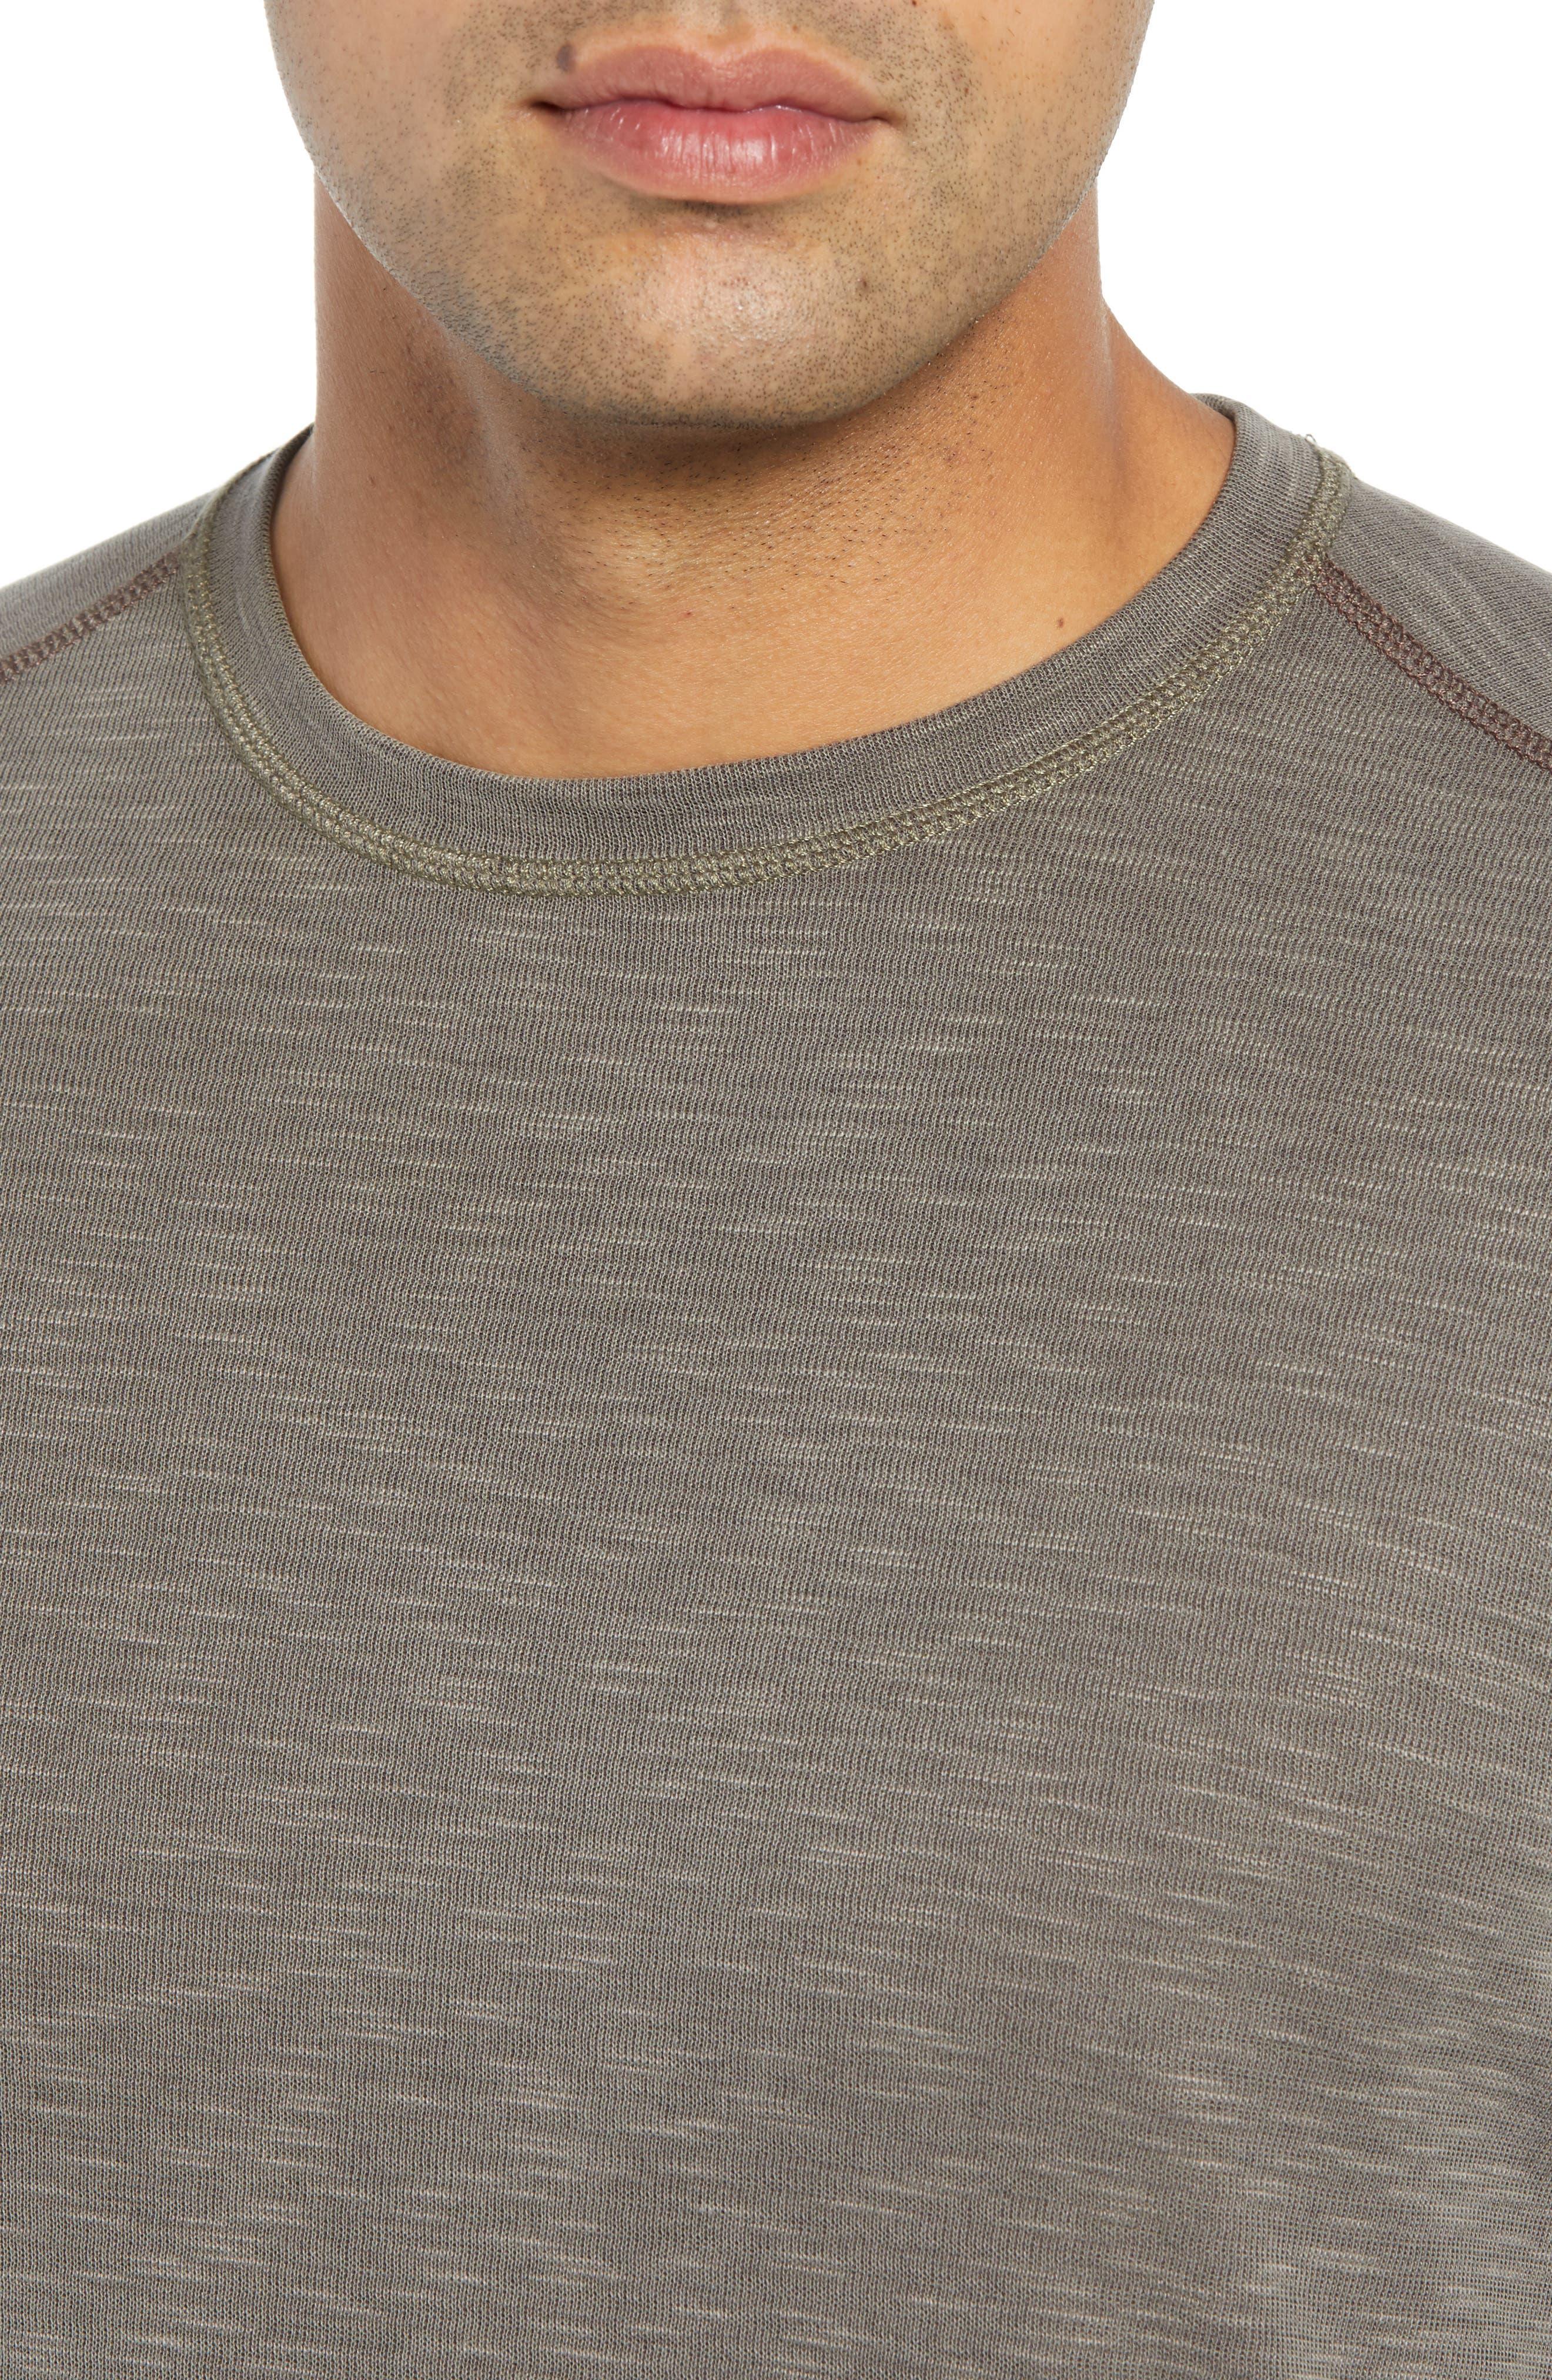 Flip Tide Standard Fit T-Shirt,                             Alternate thumbnail 5, color,                             BITTERSWEET CHOCOLATE